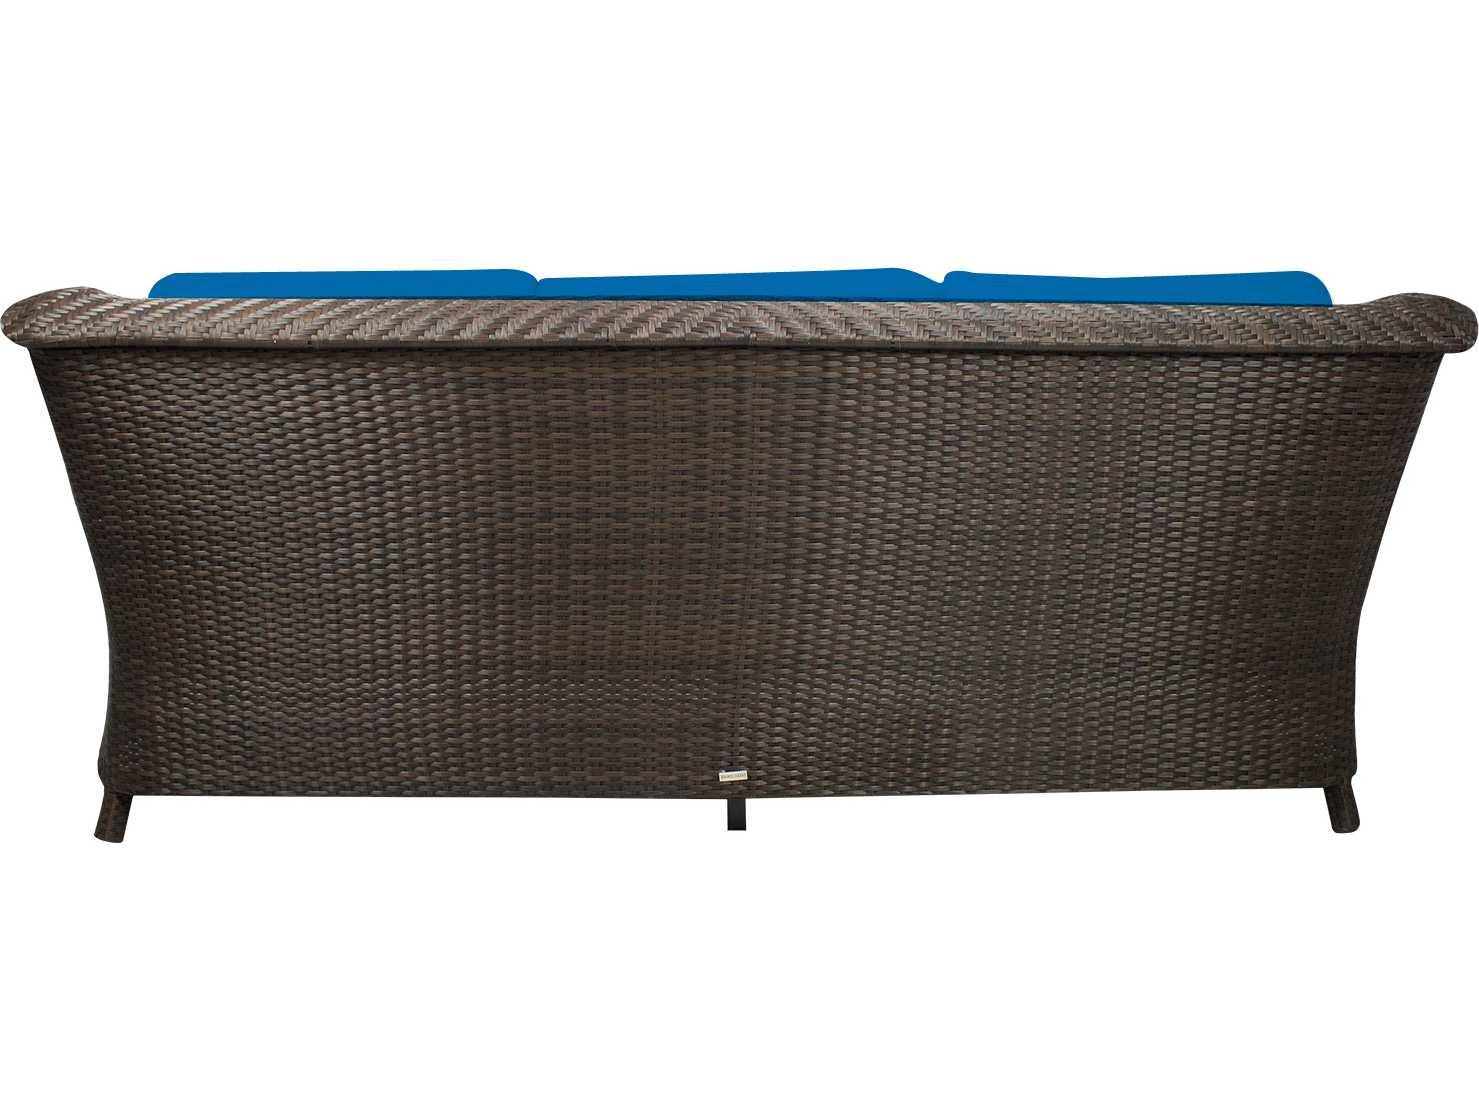 Source outdoor furniture tahiti wicker sofa so 2011 103 for Source outdoor furniture